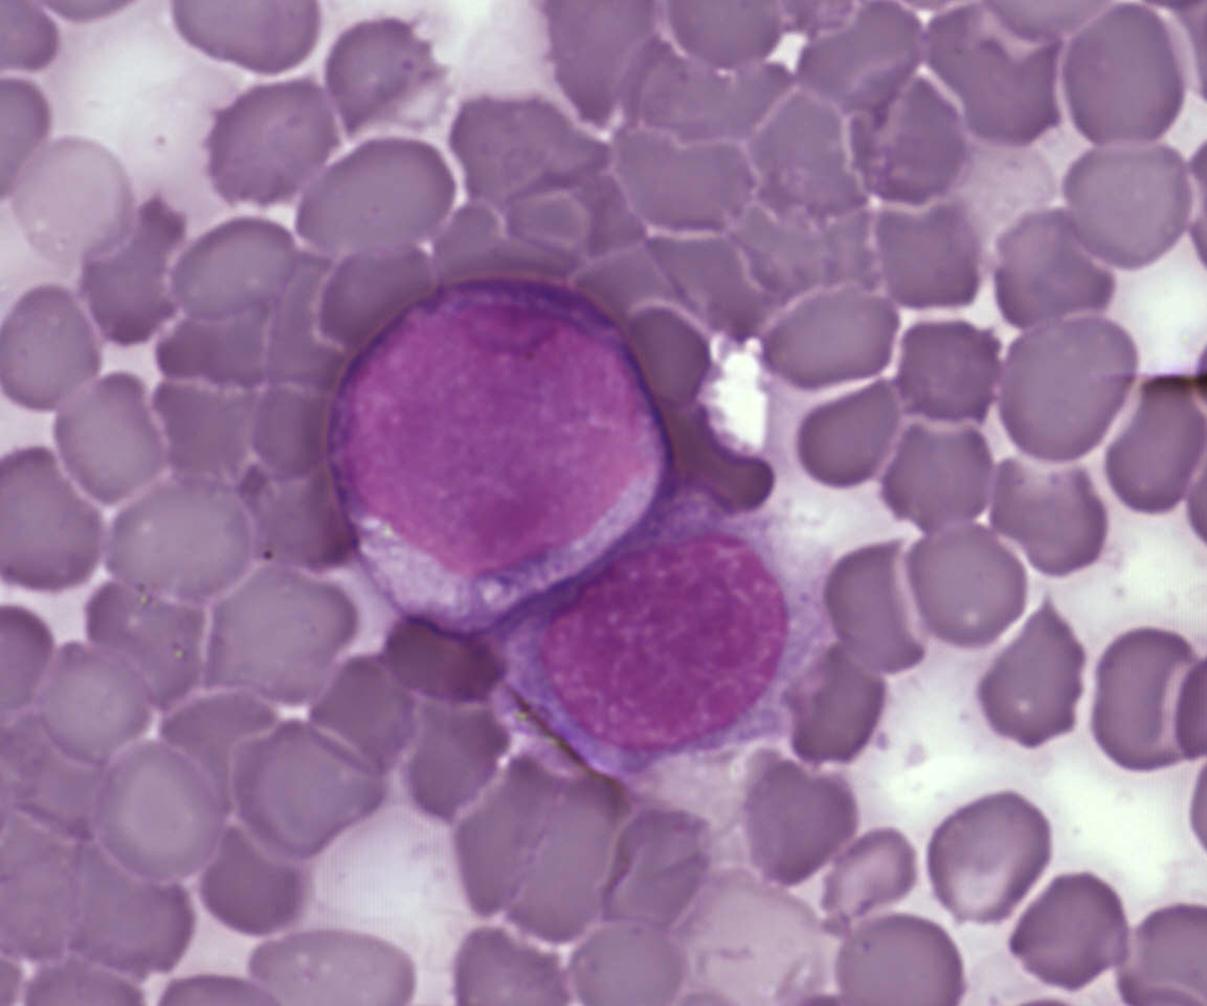 Leukemia cells. / Credit: A Surprising New Path to Tumor Development. PLoS Biol 3/12/2005 doi:10.1371/journal.pbio.0030433